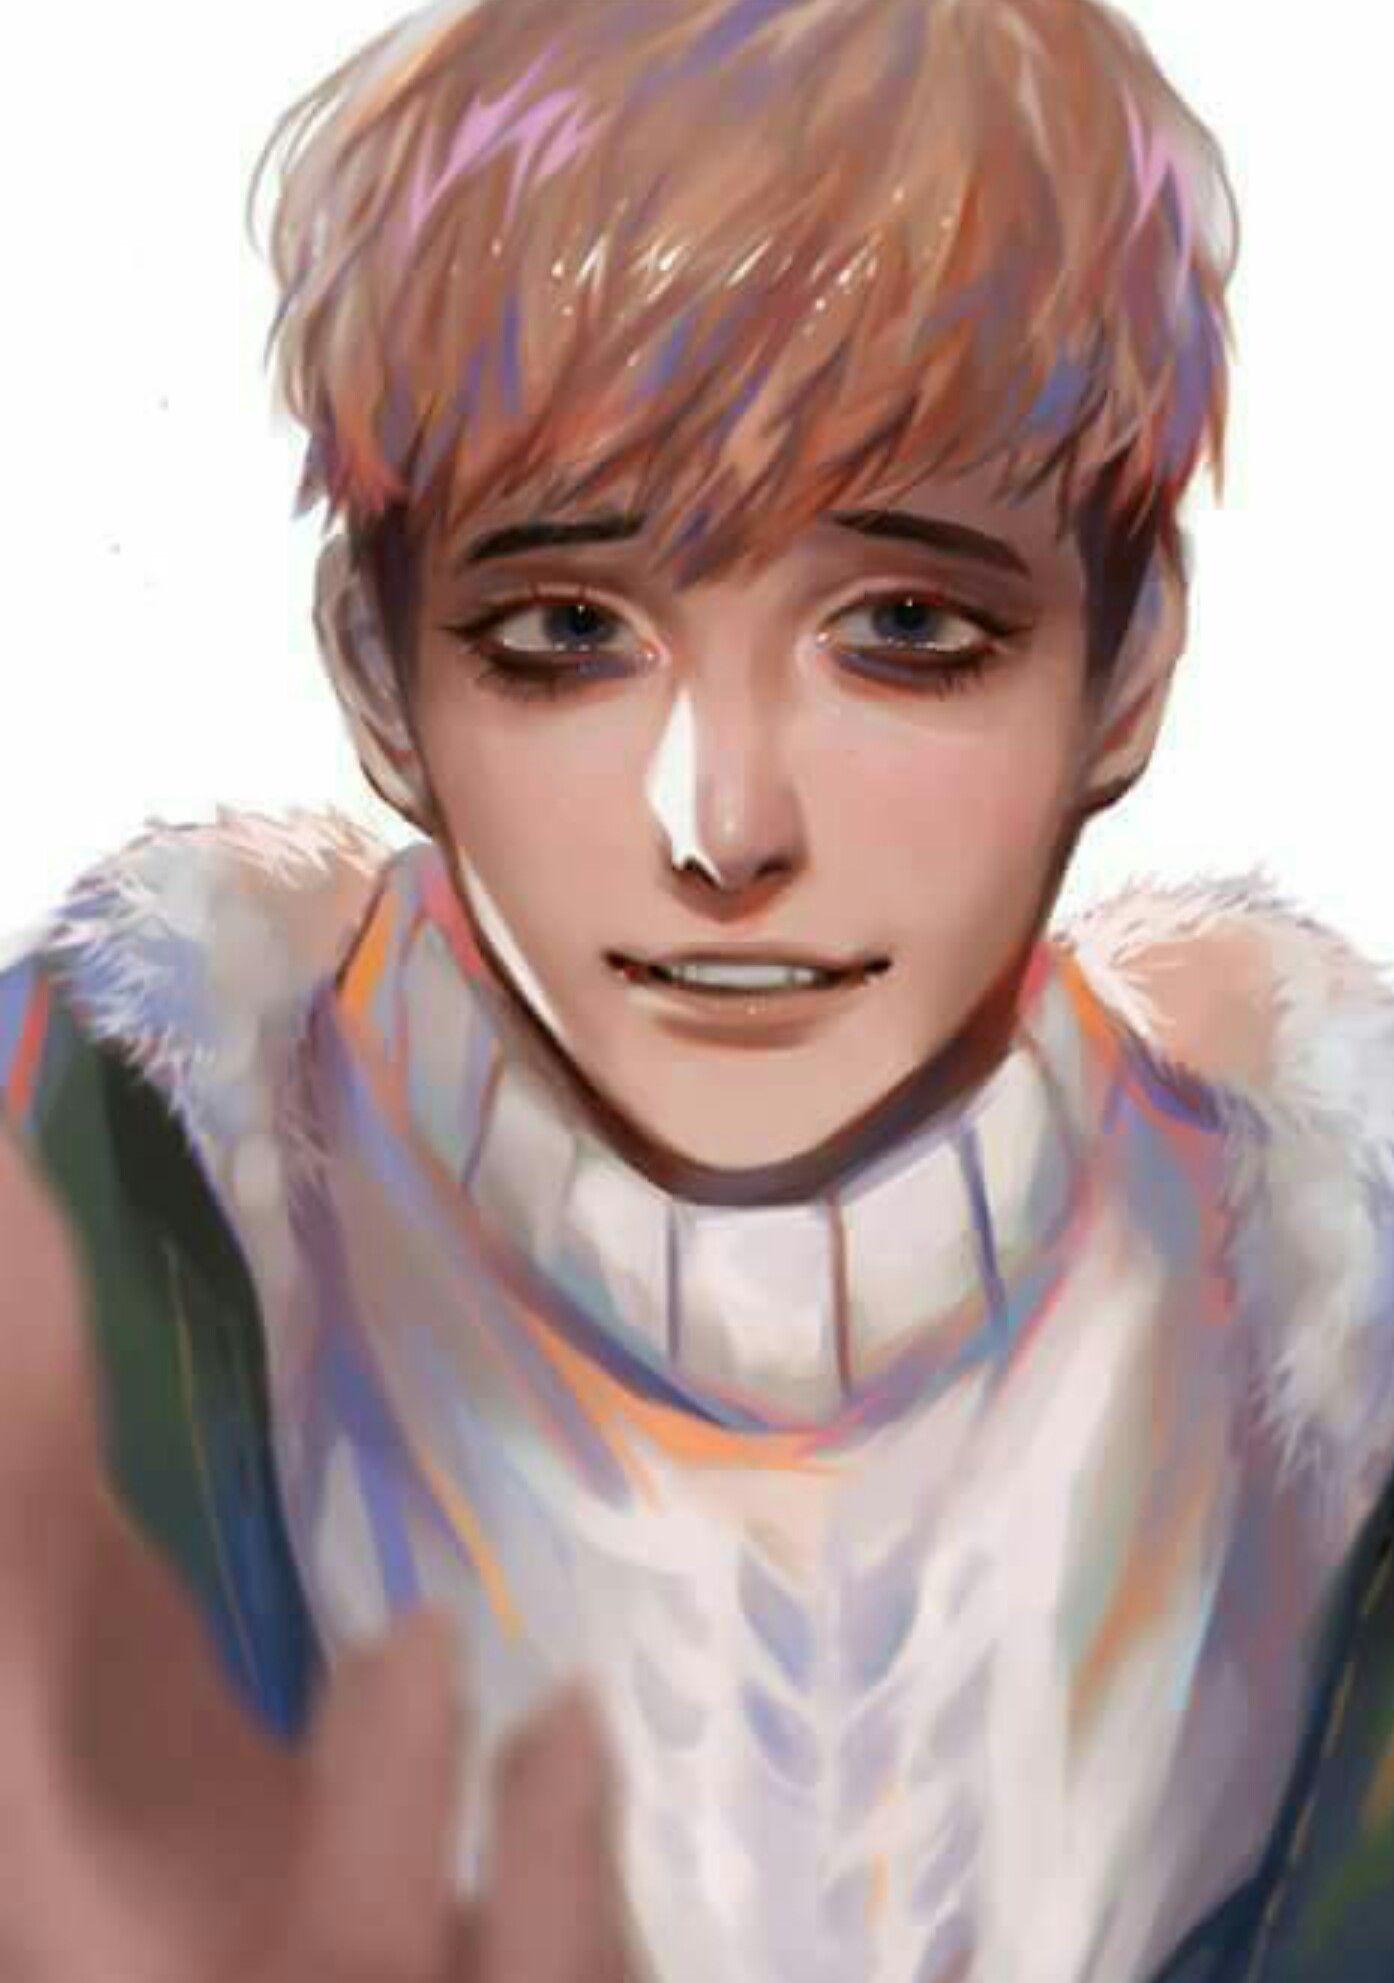 Sangwoo   Killing stalking   Pinterest   Anime and Manga